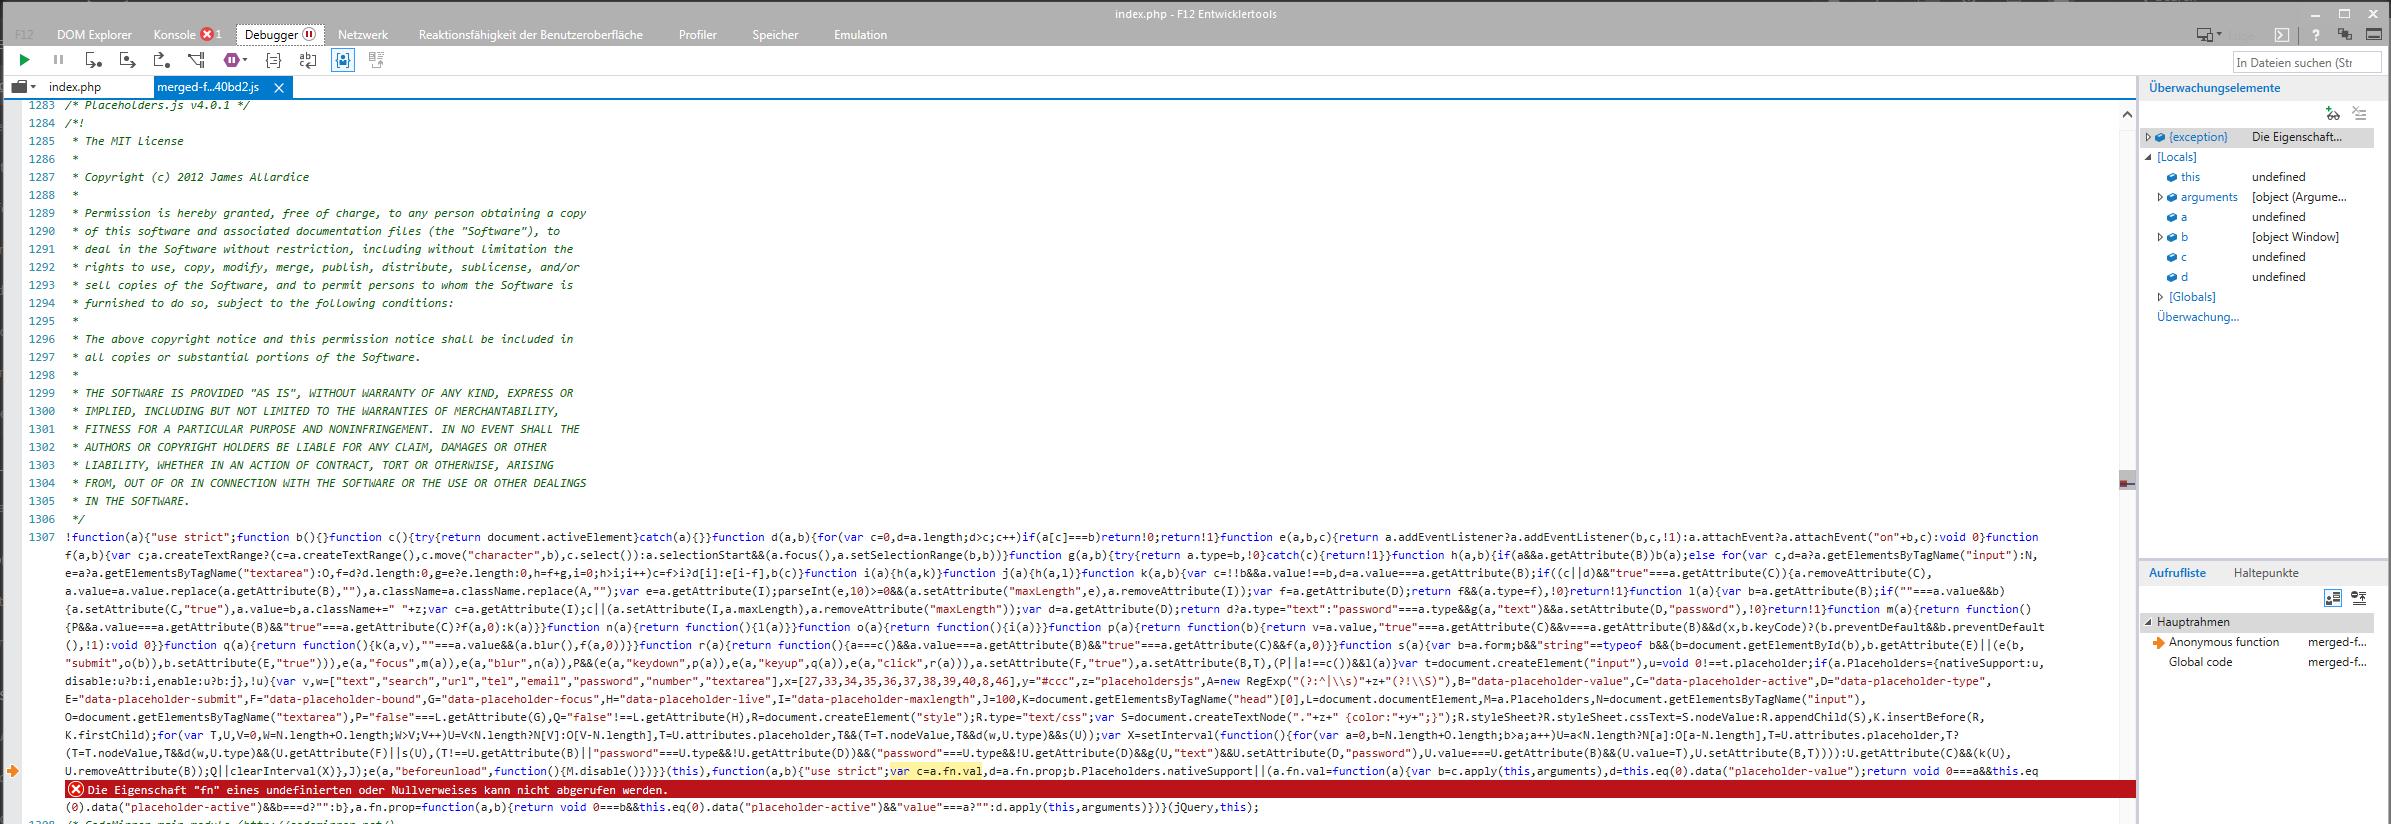 Bug #76463: JavaScript errors and no RTE in IE11 - TYPO3 Core